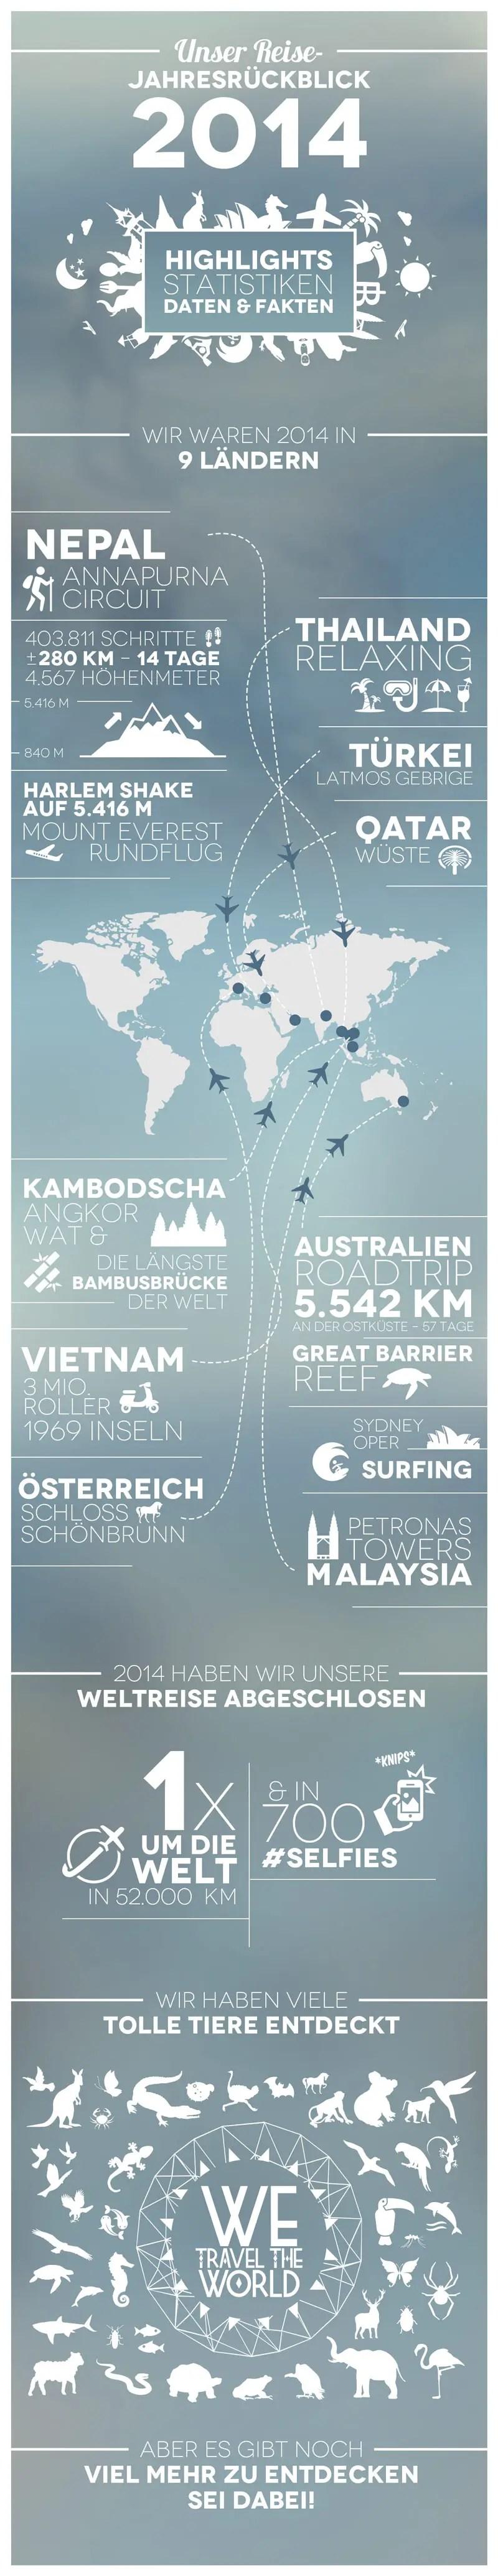 wetraveltheworld_jahresrueckblick-2014_infografik